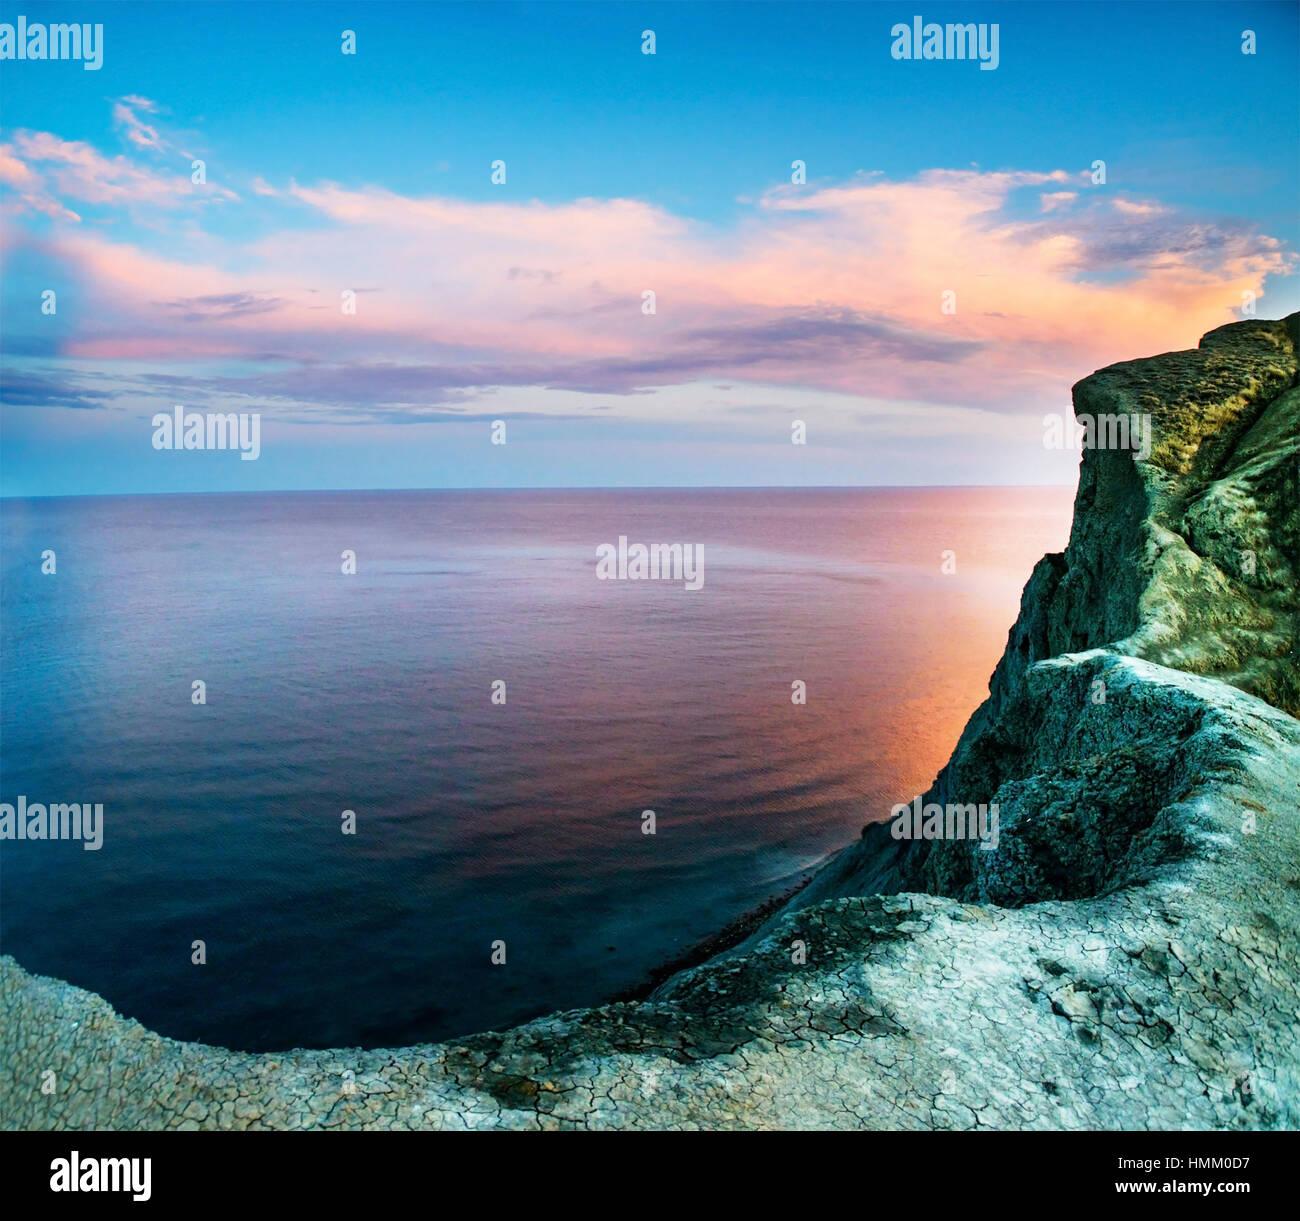 Rocks and sea. Dramatic scene. - Stock Image